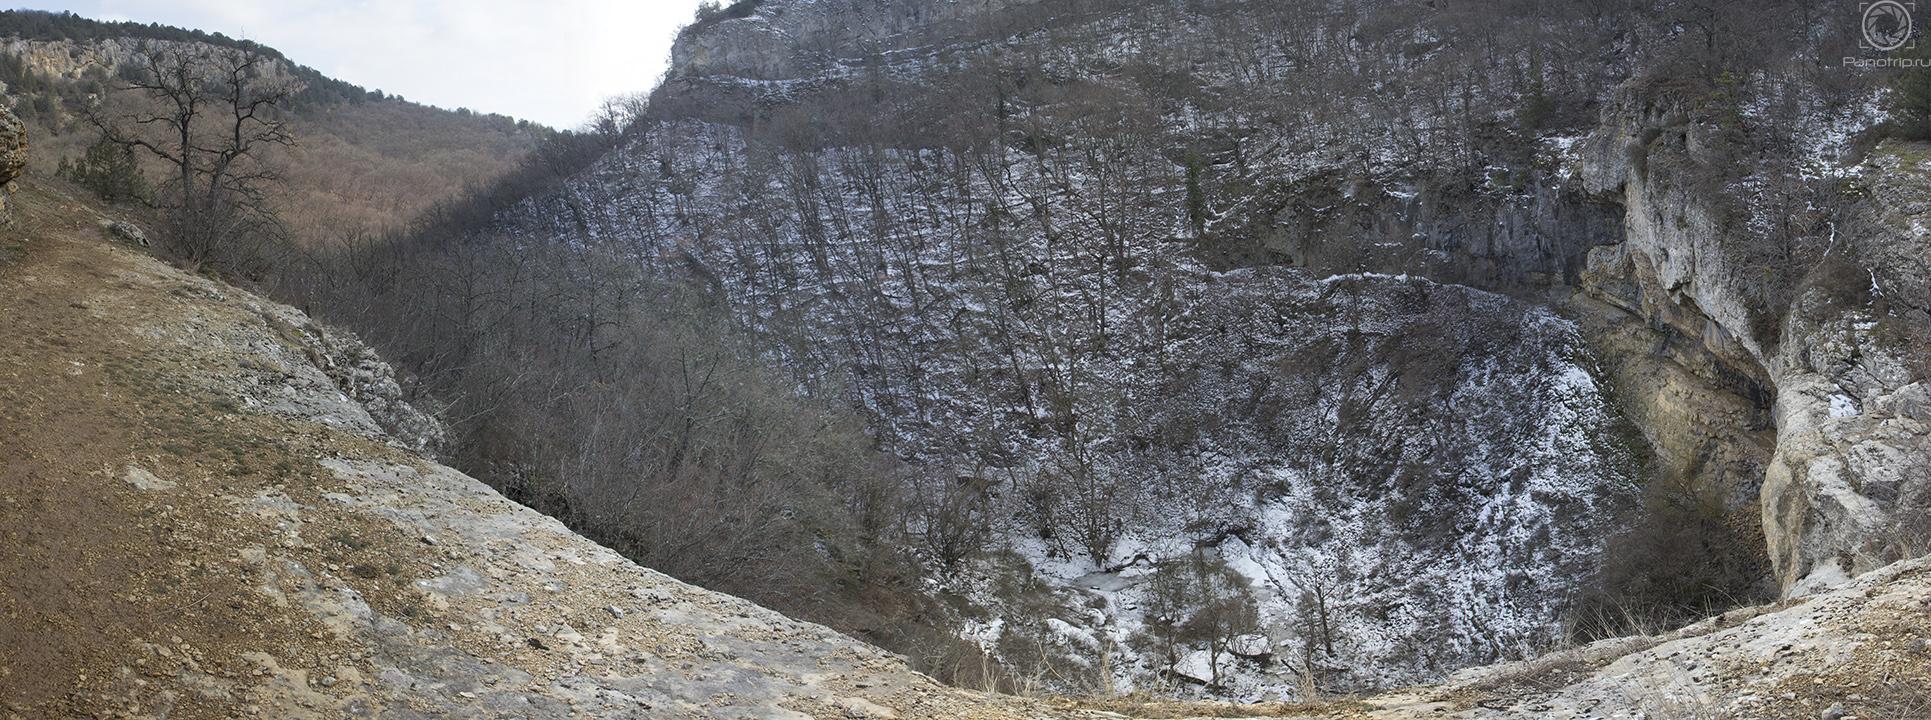 Грот Фатьма-Коба